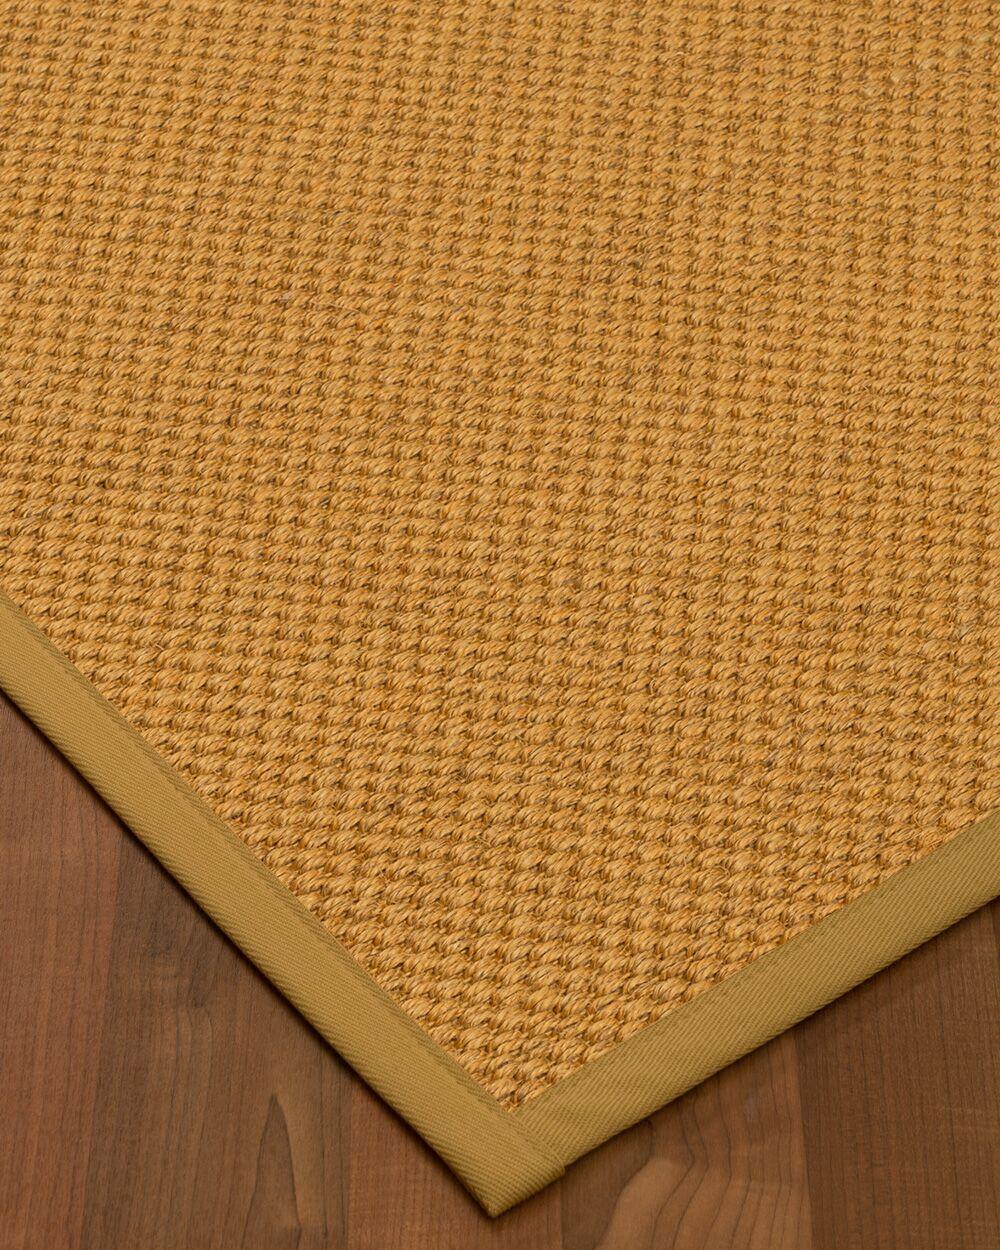 Halter Hand-Woven Beige Area Rug Rug Size: Rectangle 9' x 12'